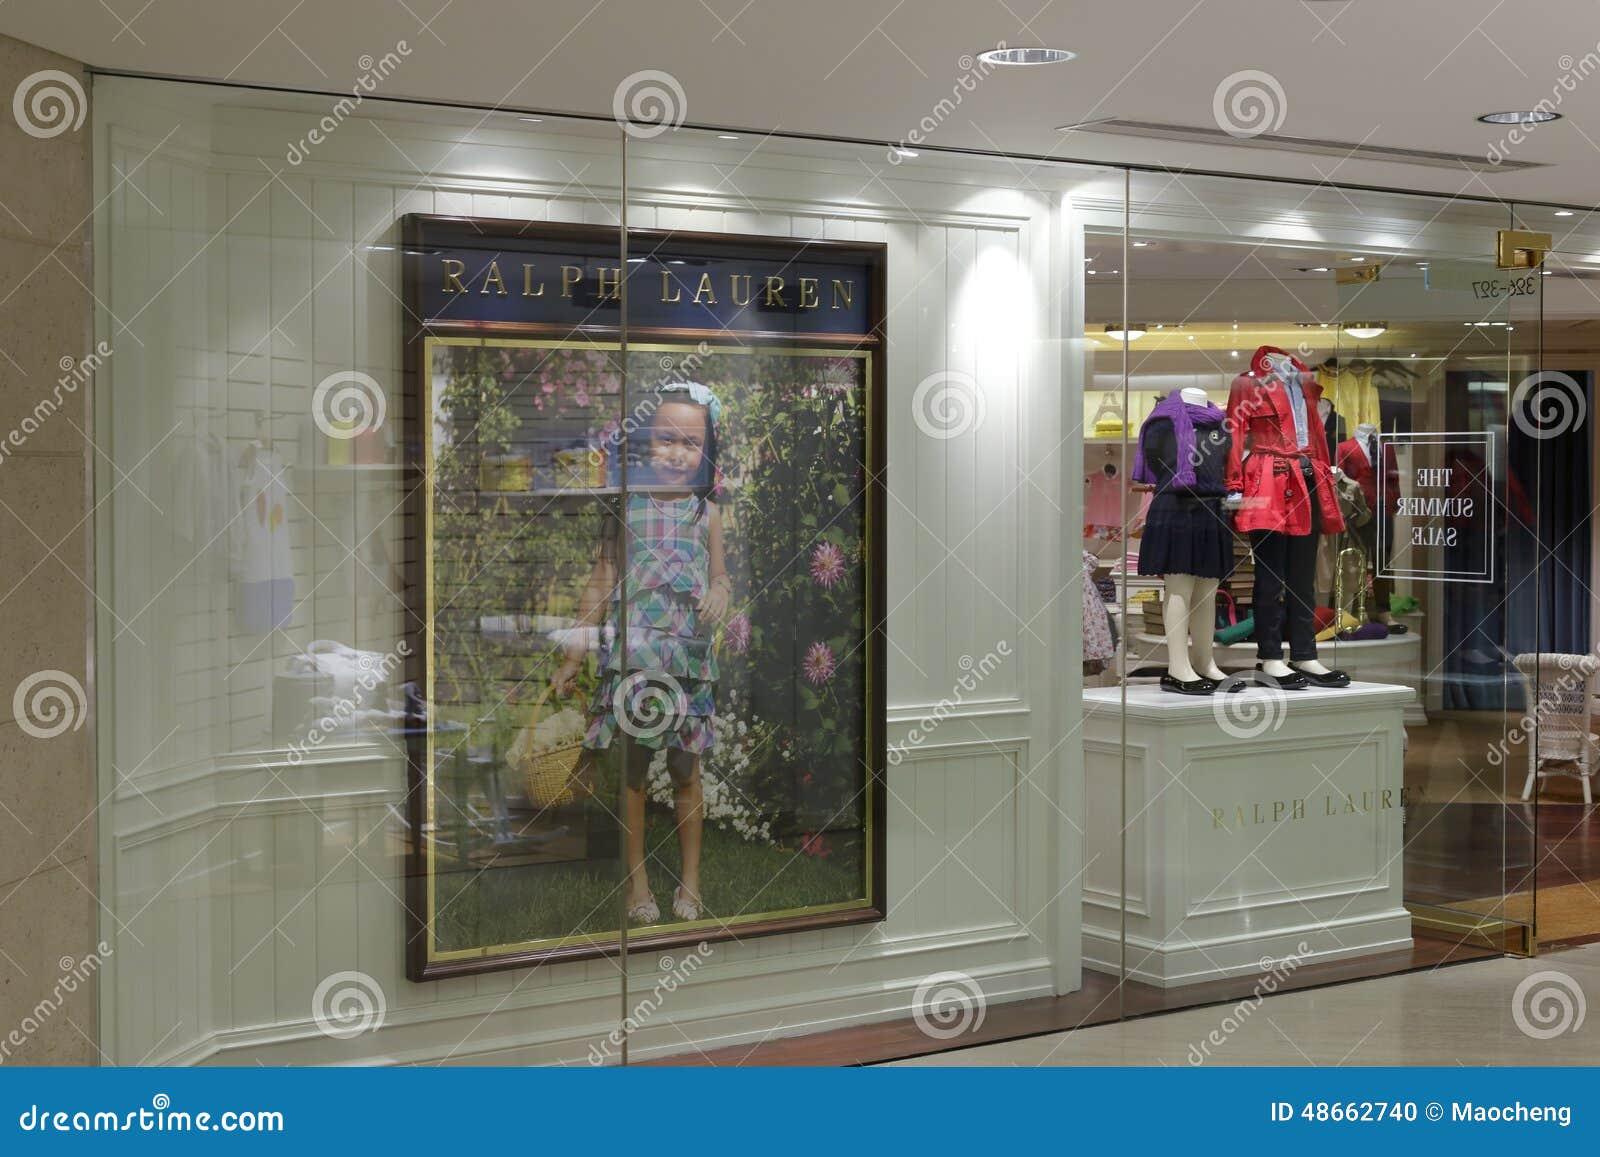 b6b01df78 Ralph Lauren Children s Clothing Store Editorial Image - Image of ...